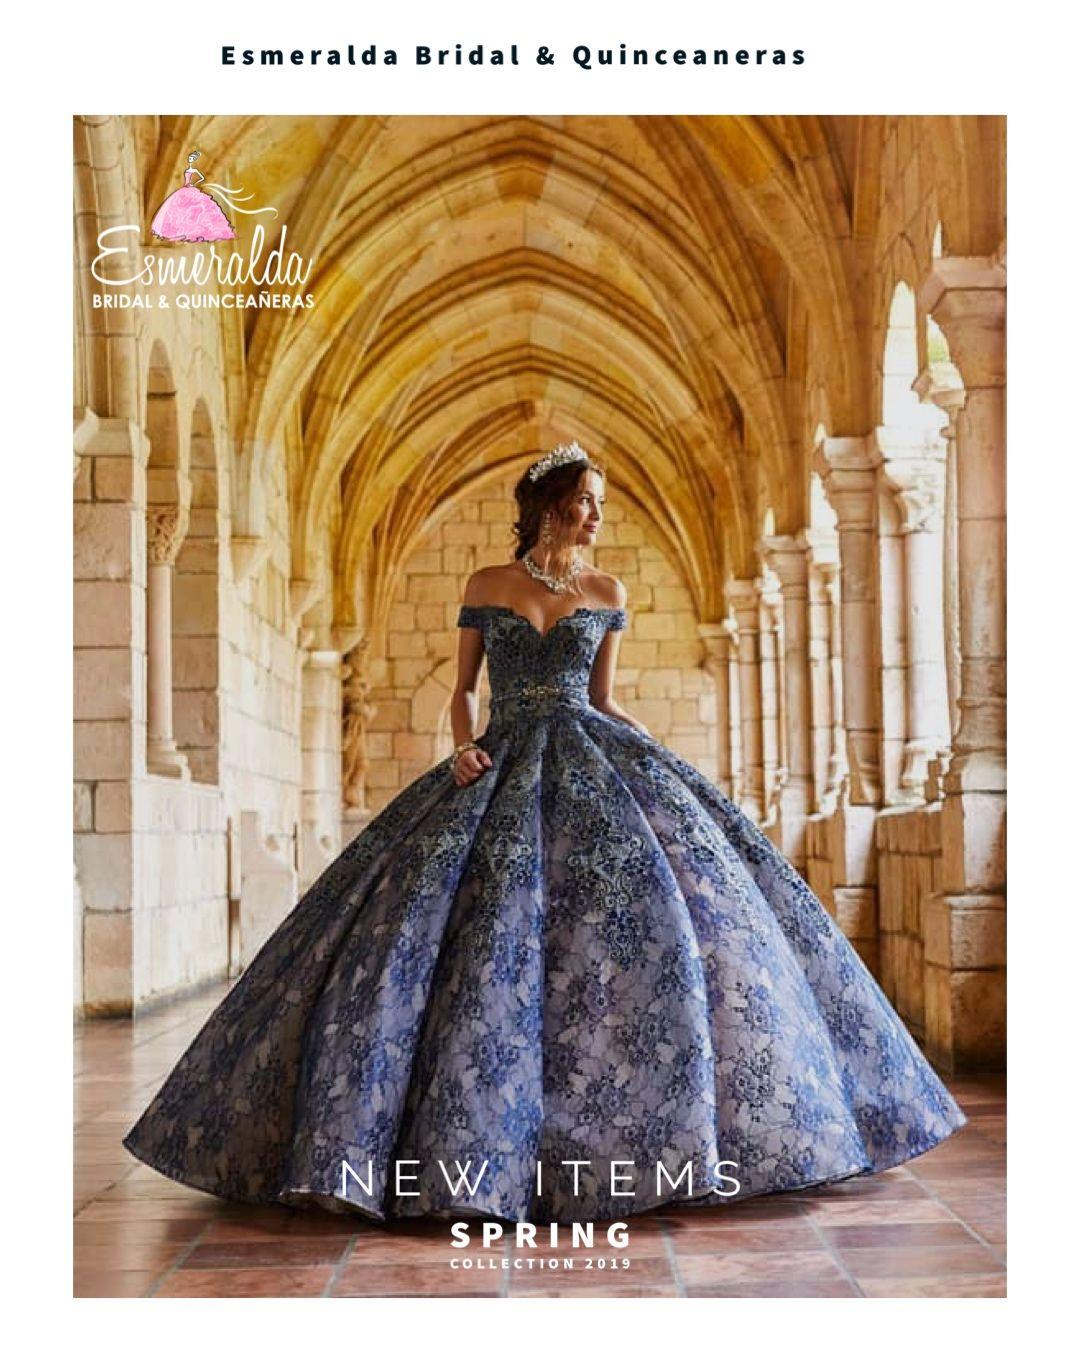 0eab6870e44 Esmeralda Bridal   Quinceanera (Esmequince) on Pinterest